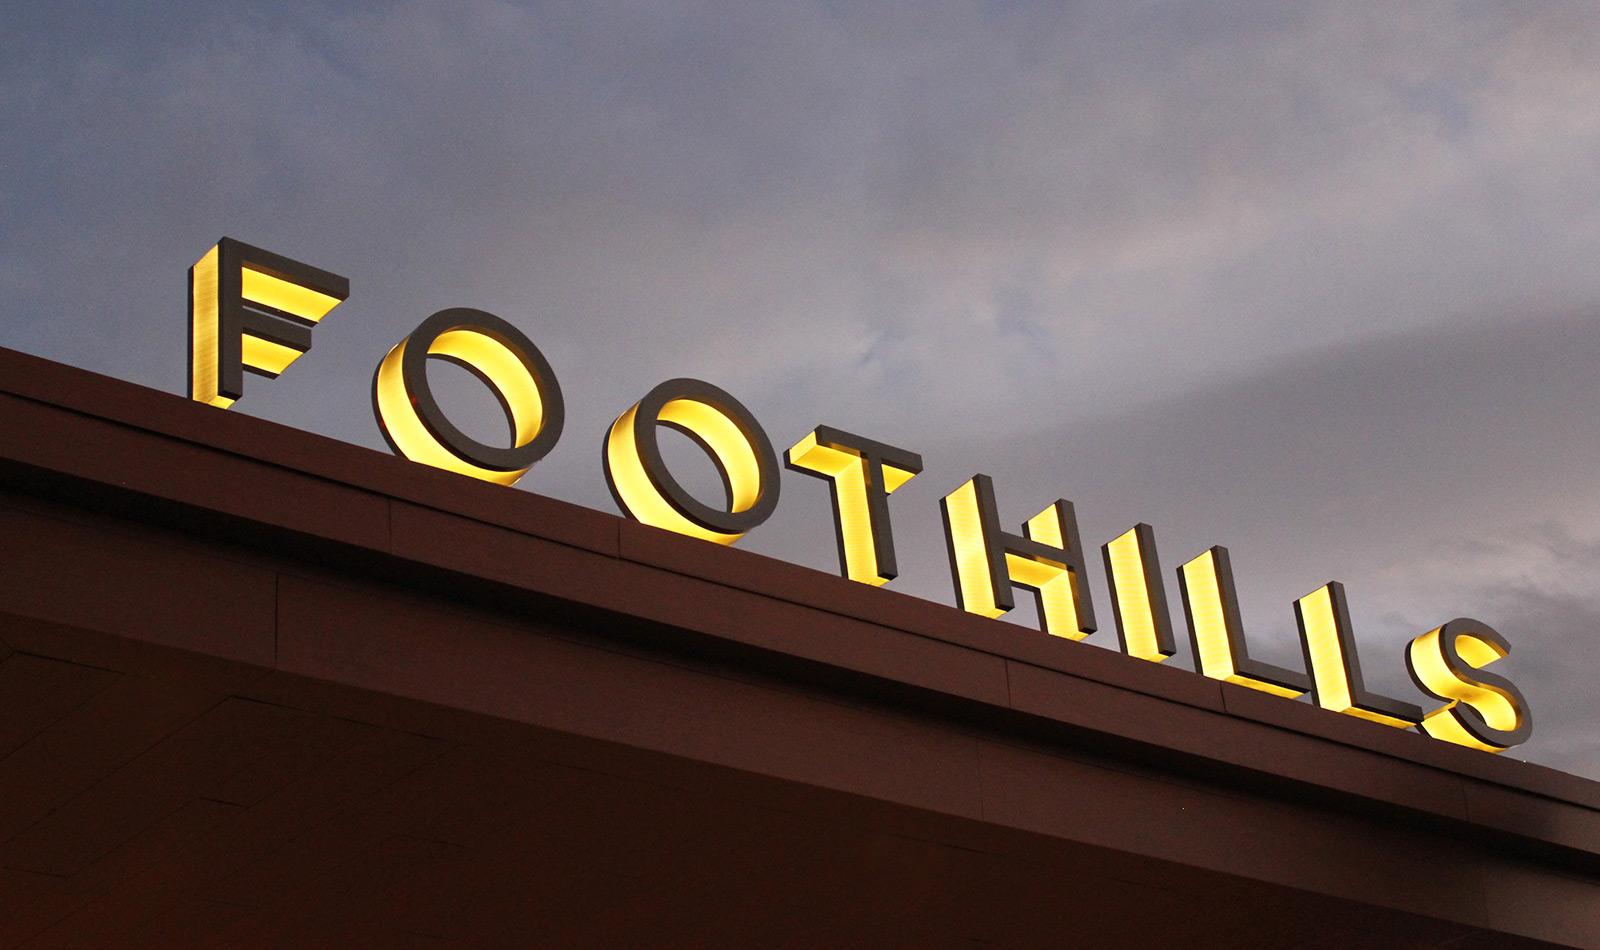 Foothills - 505Design